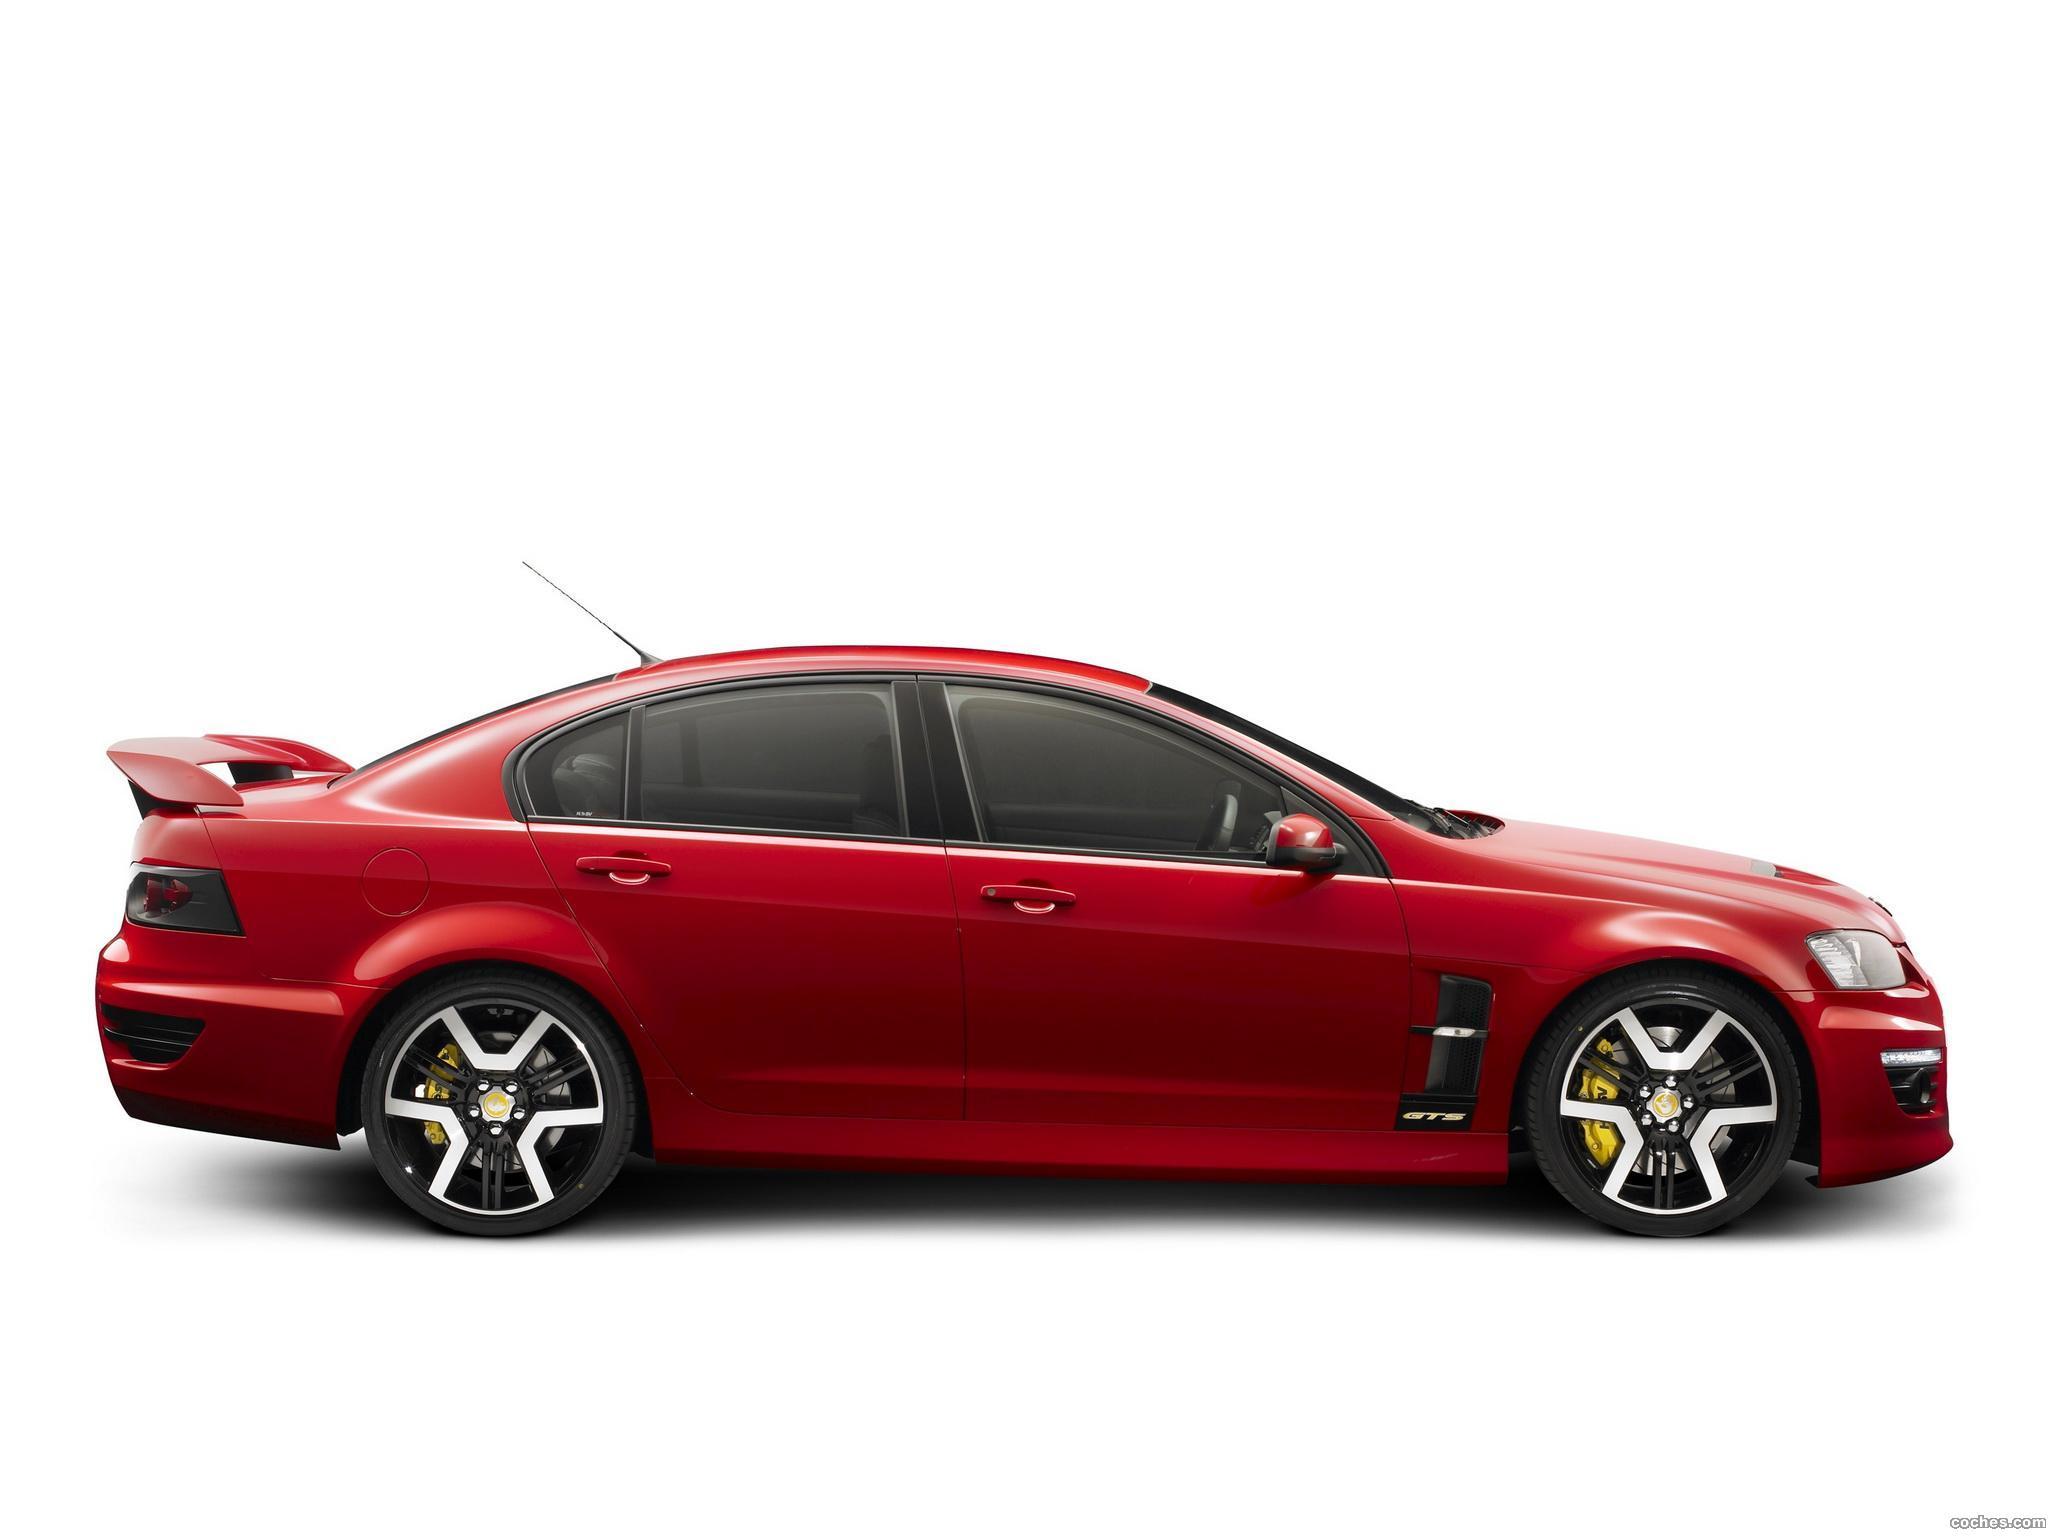 Foto 2 de Holden HSV GTS 2010